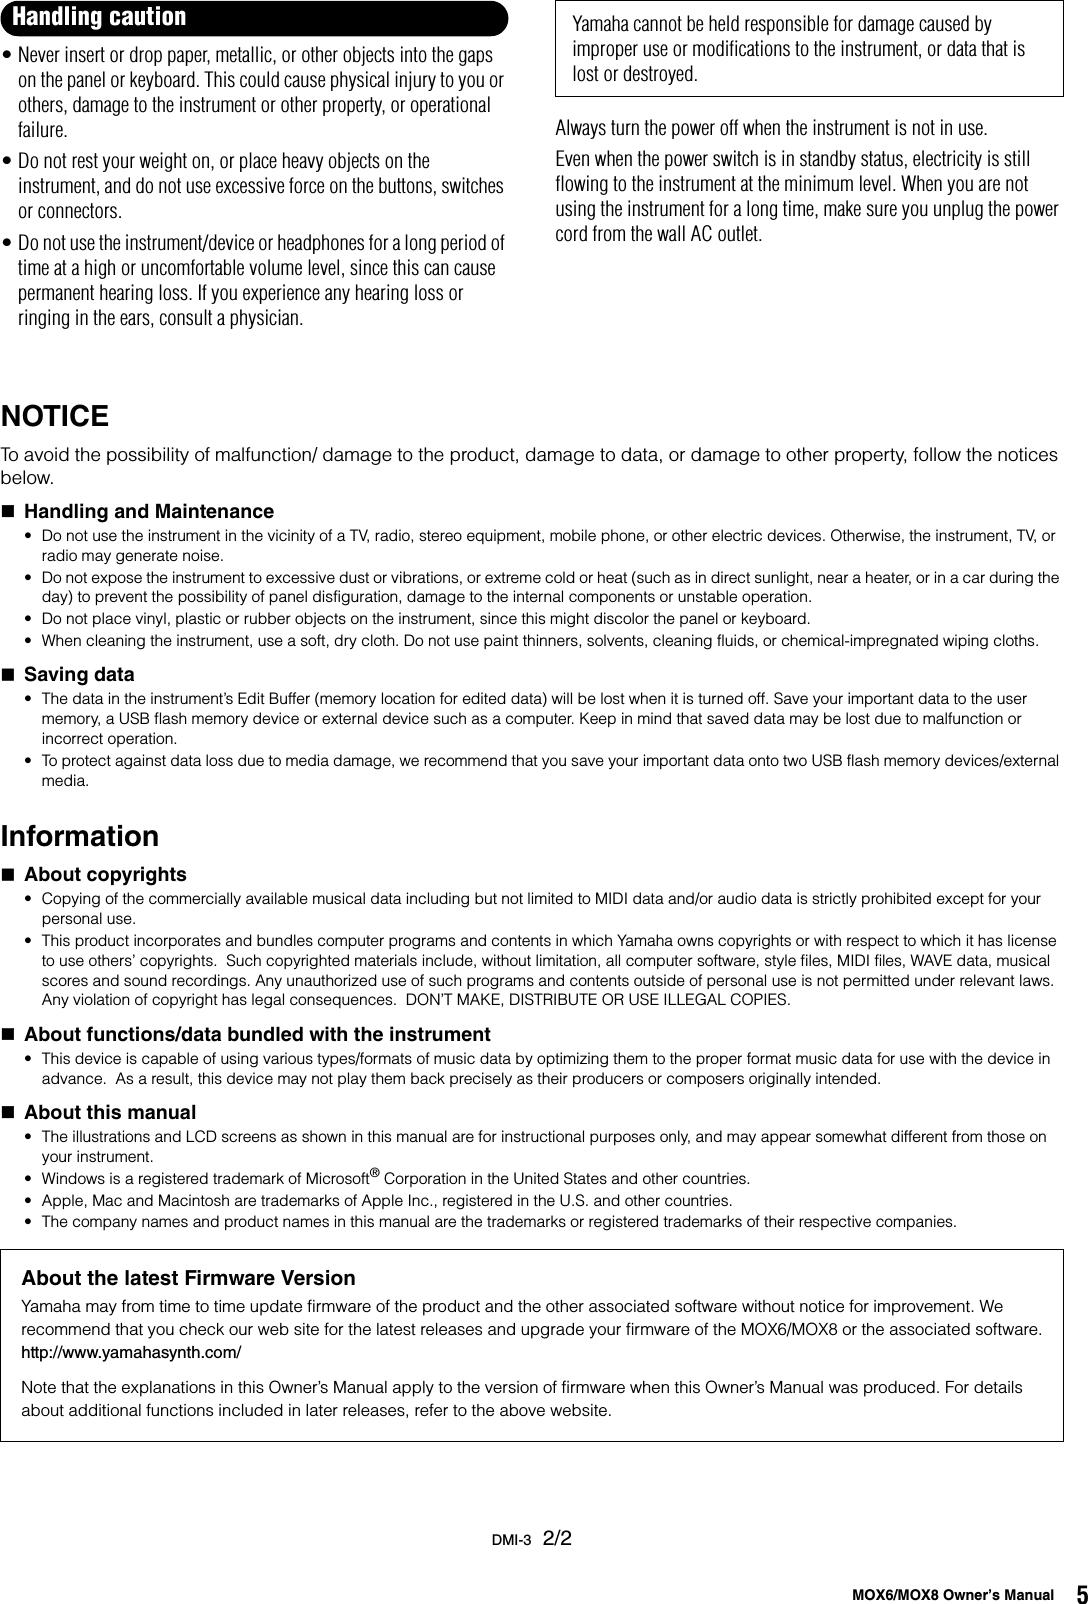 Yamaha MOX6 / MOX8 Owner's Manual MOX6/MOX8 Owner's Mox6mox8 En Om B0